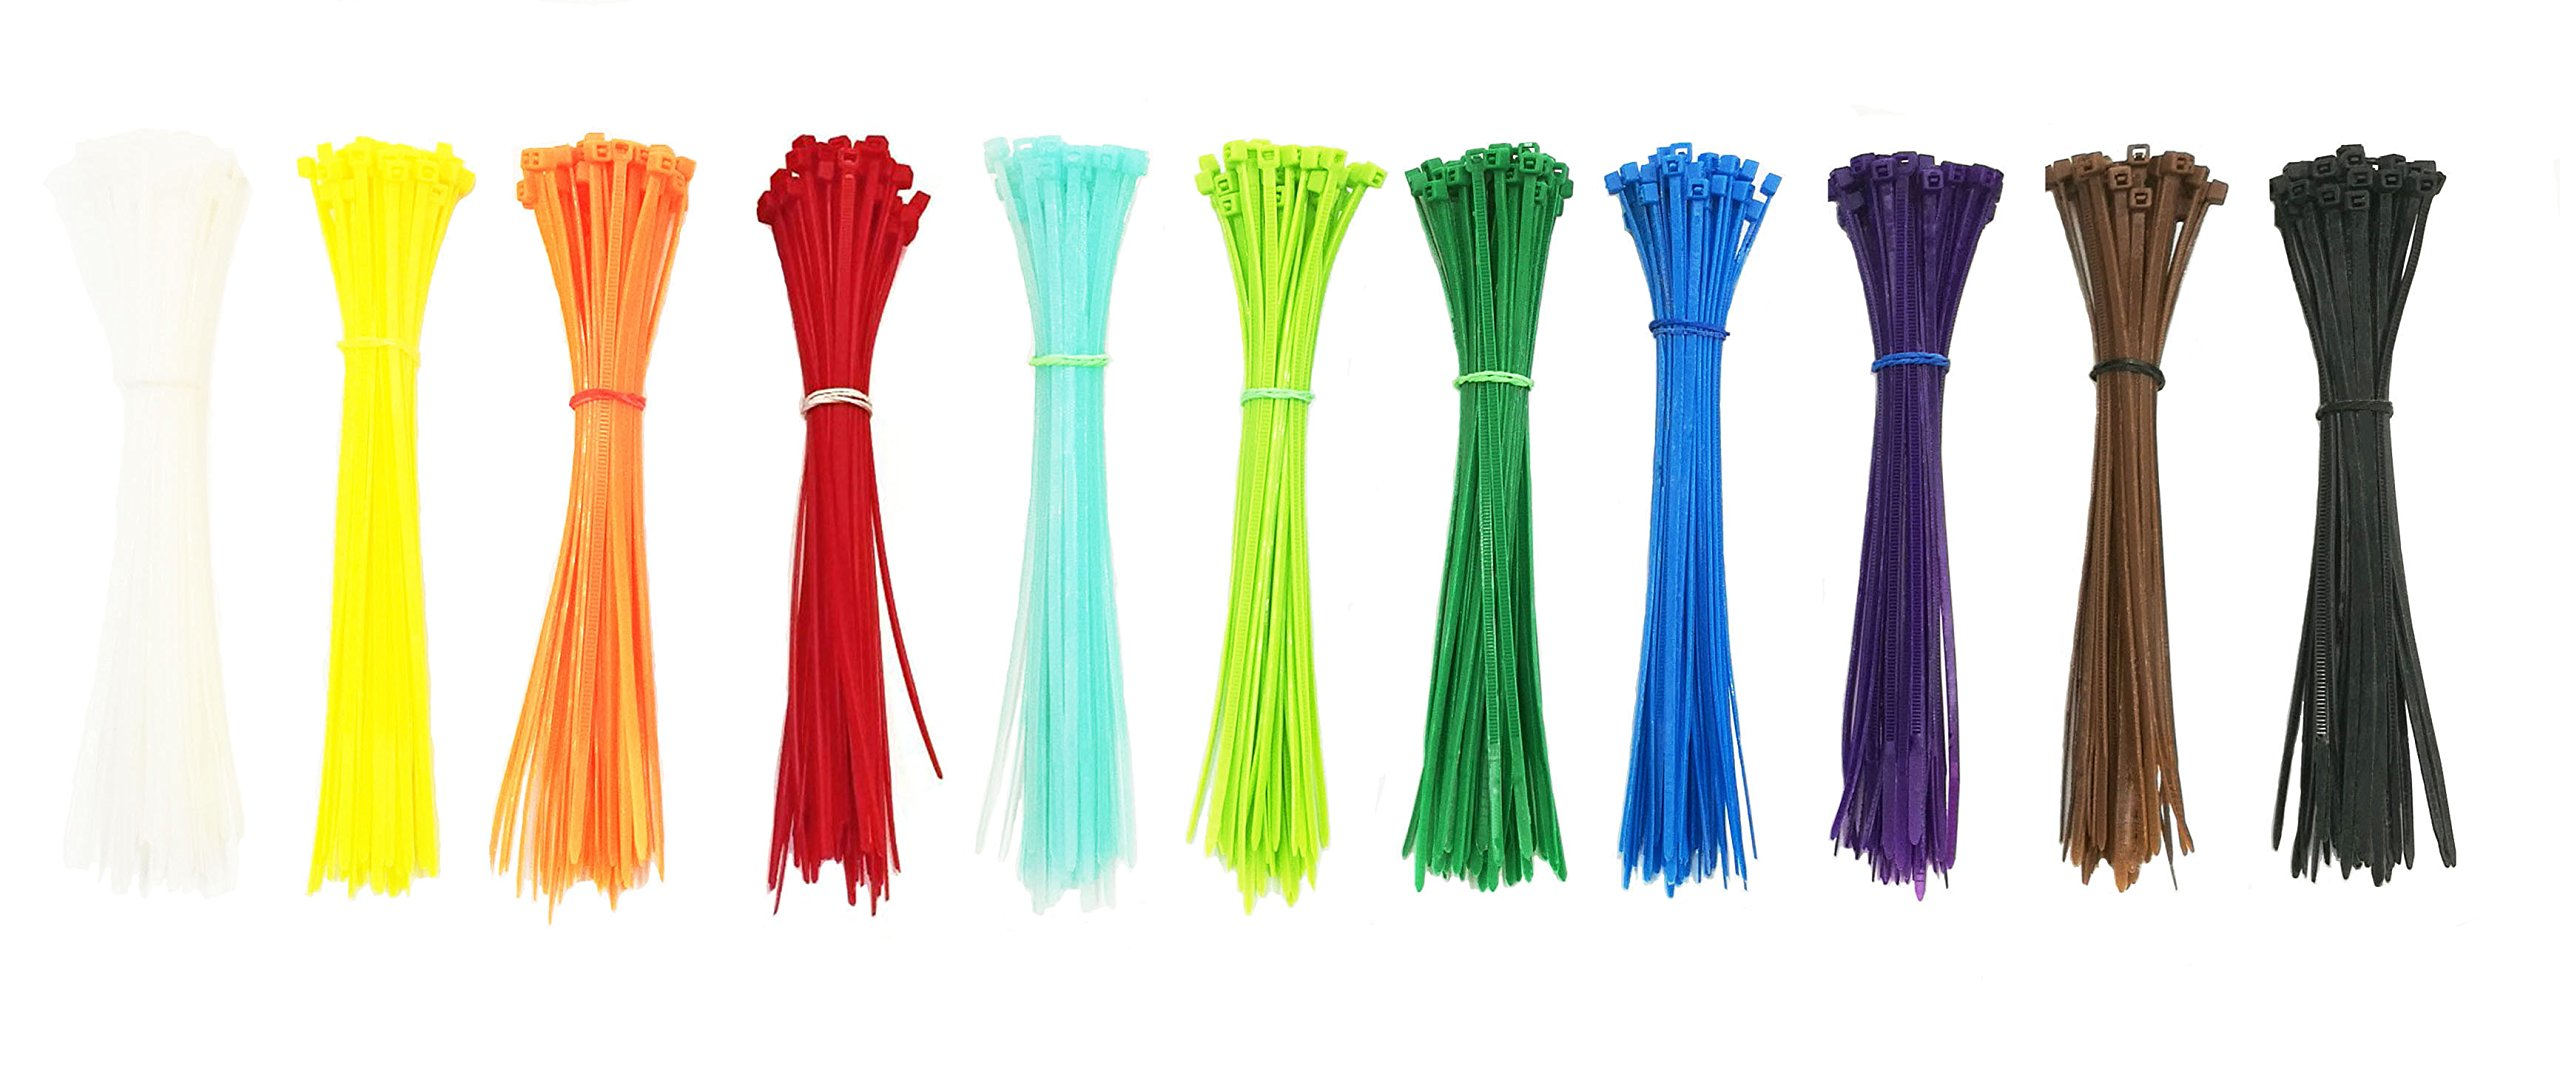 SummerHome Self Locking Nylon Cable Zip Ties in 11 Colors(Blue, Red, Green, Yellow, Fuschia, Orange, Gray, Purple)- 6'' - 550pcs